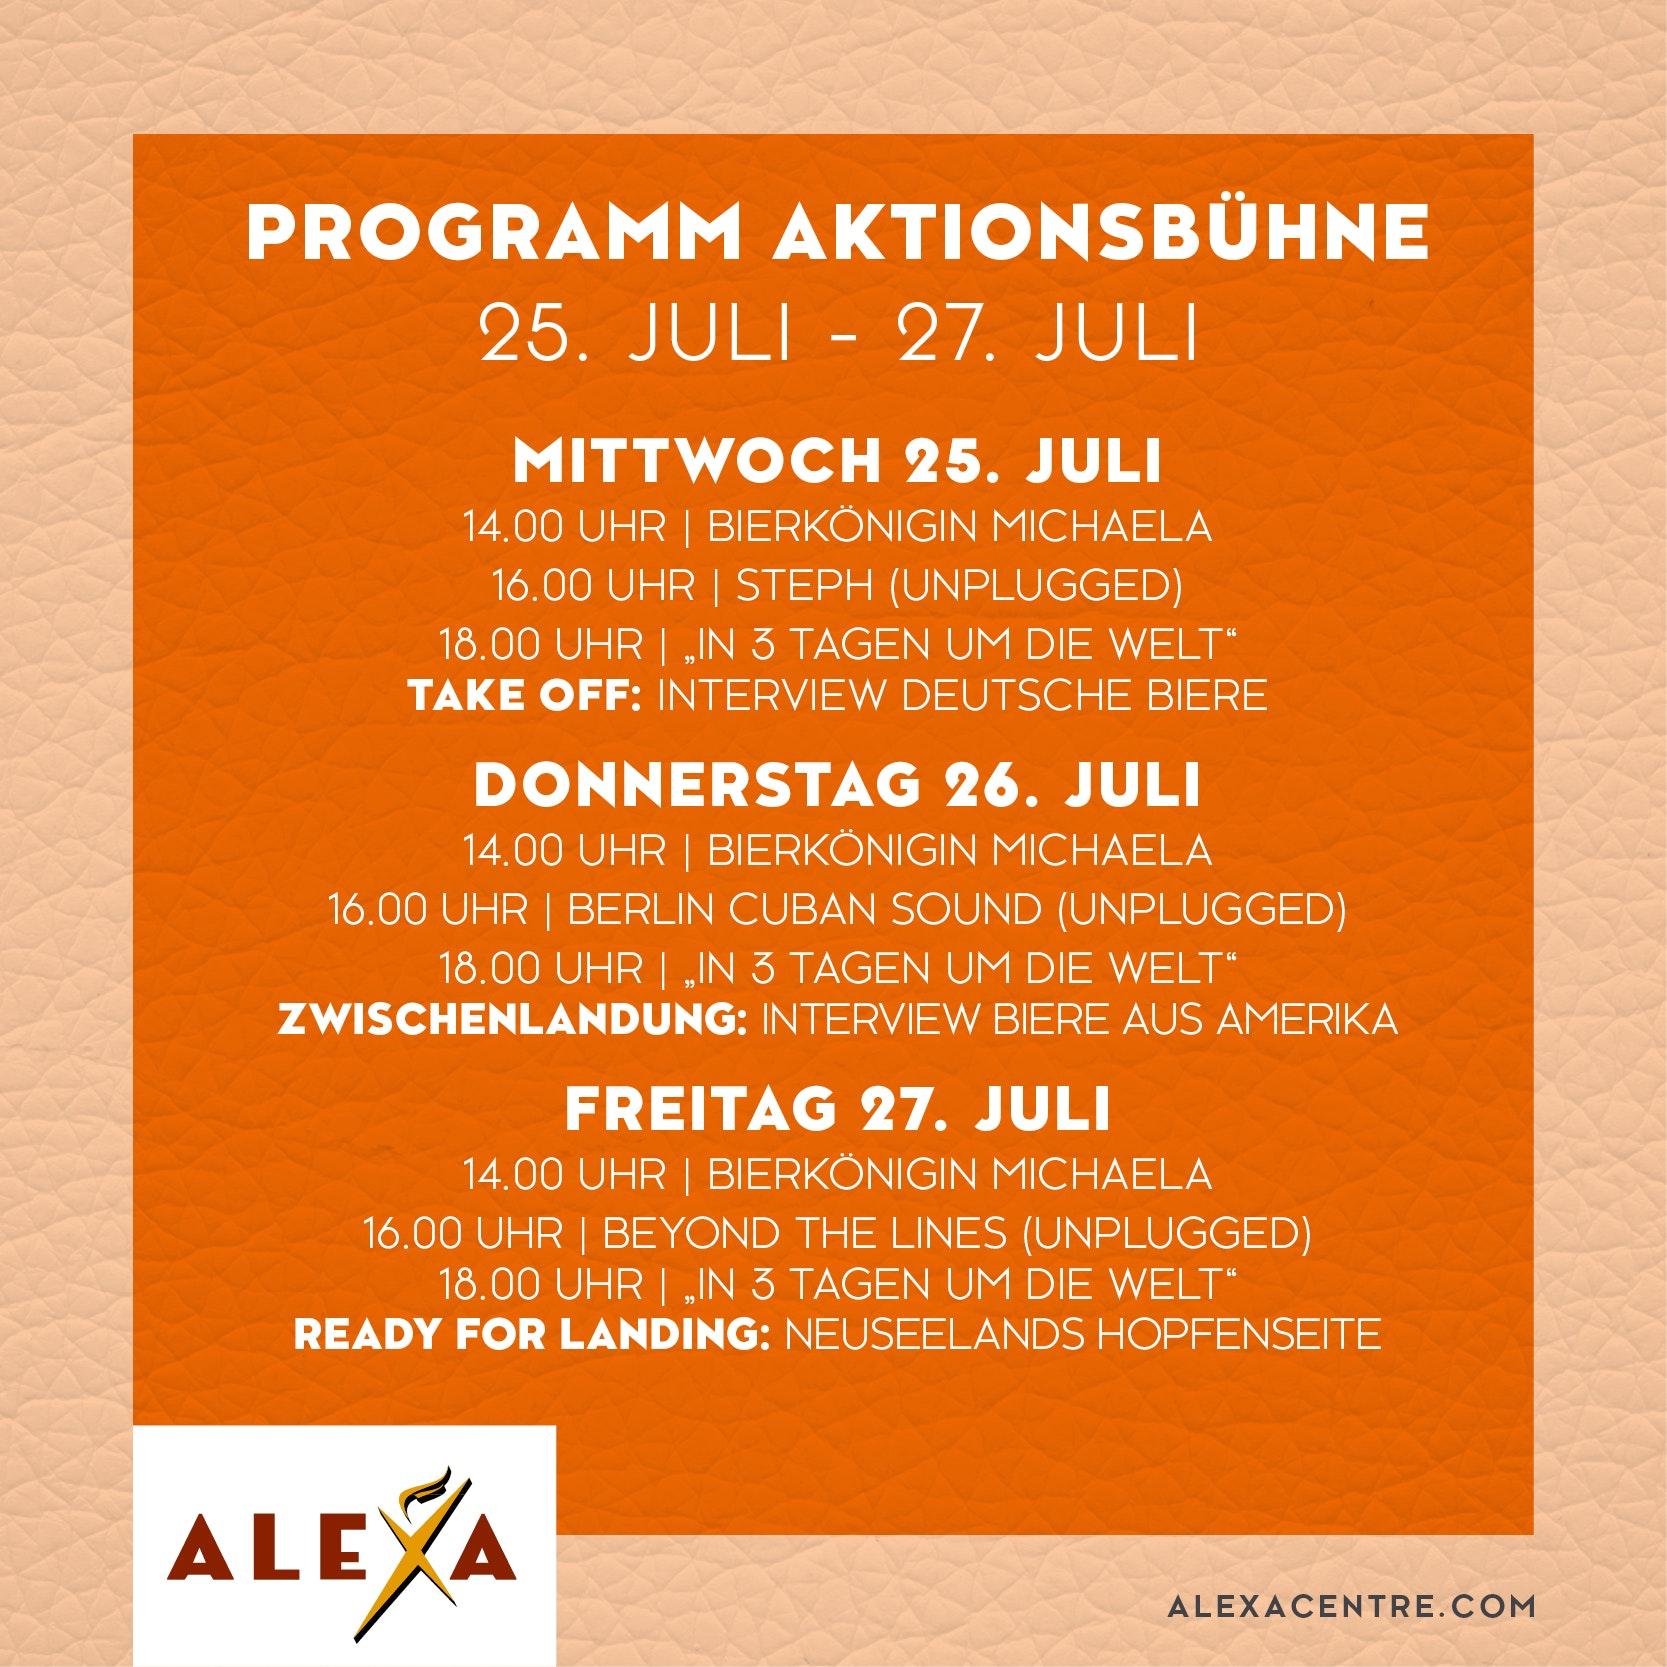 ALE-180084 Vorverkauf Bierfestival Post Programm